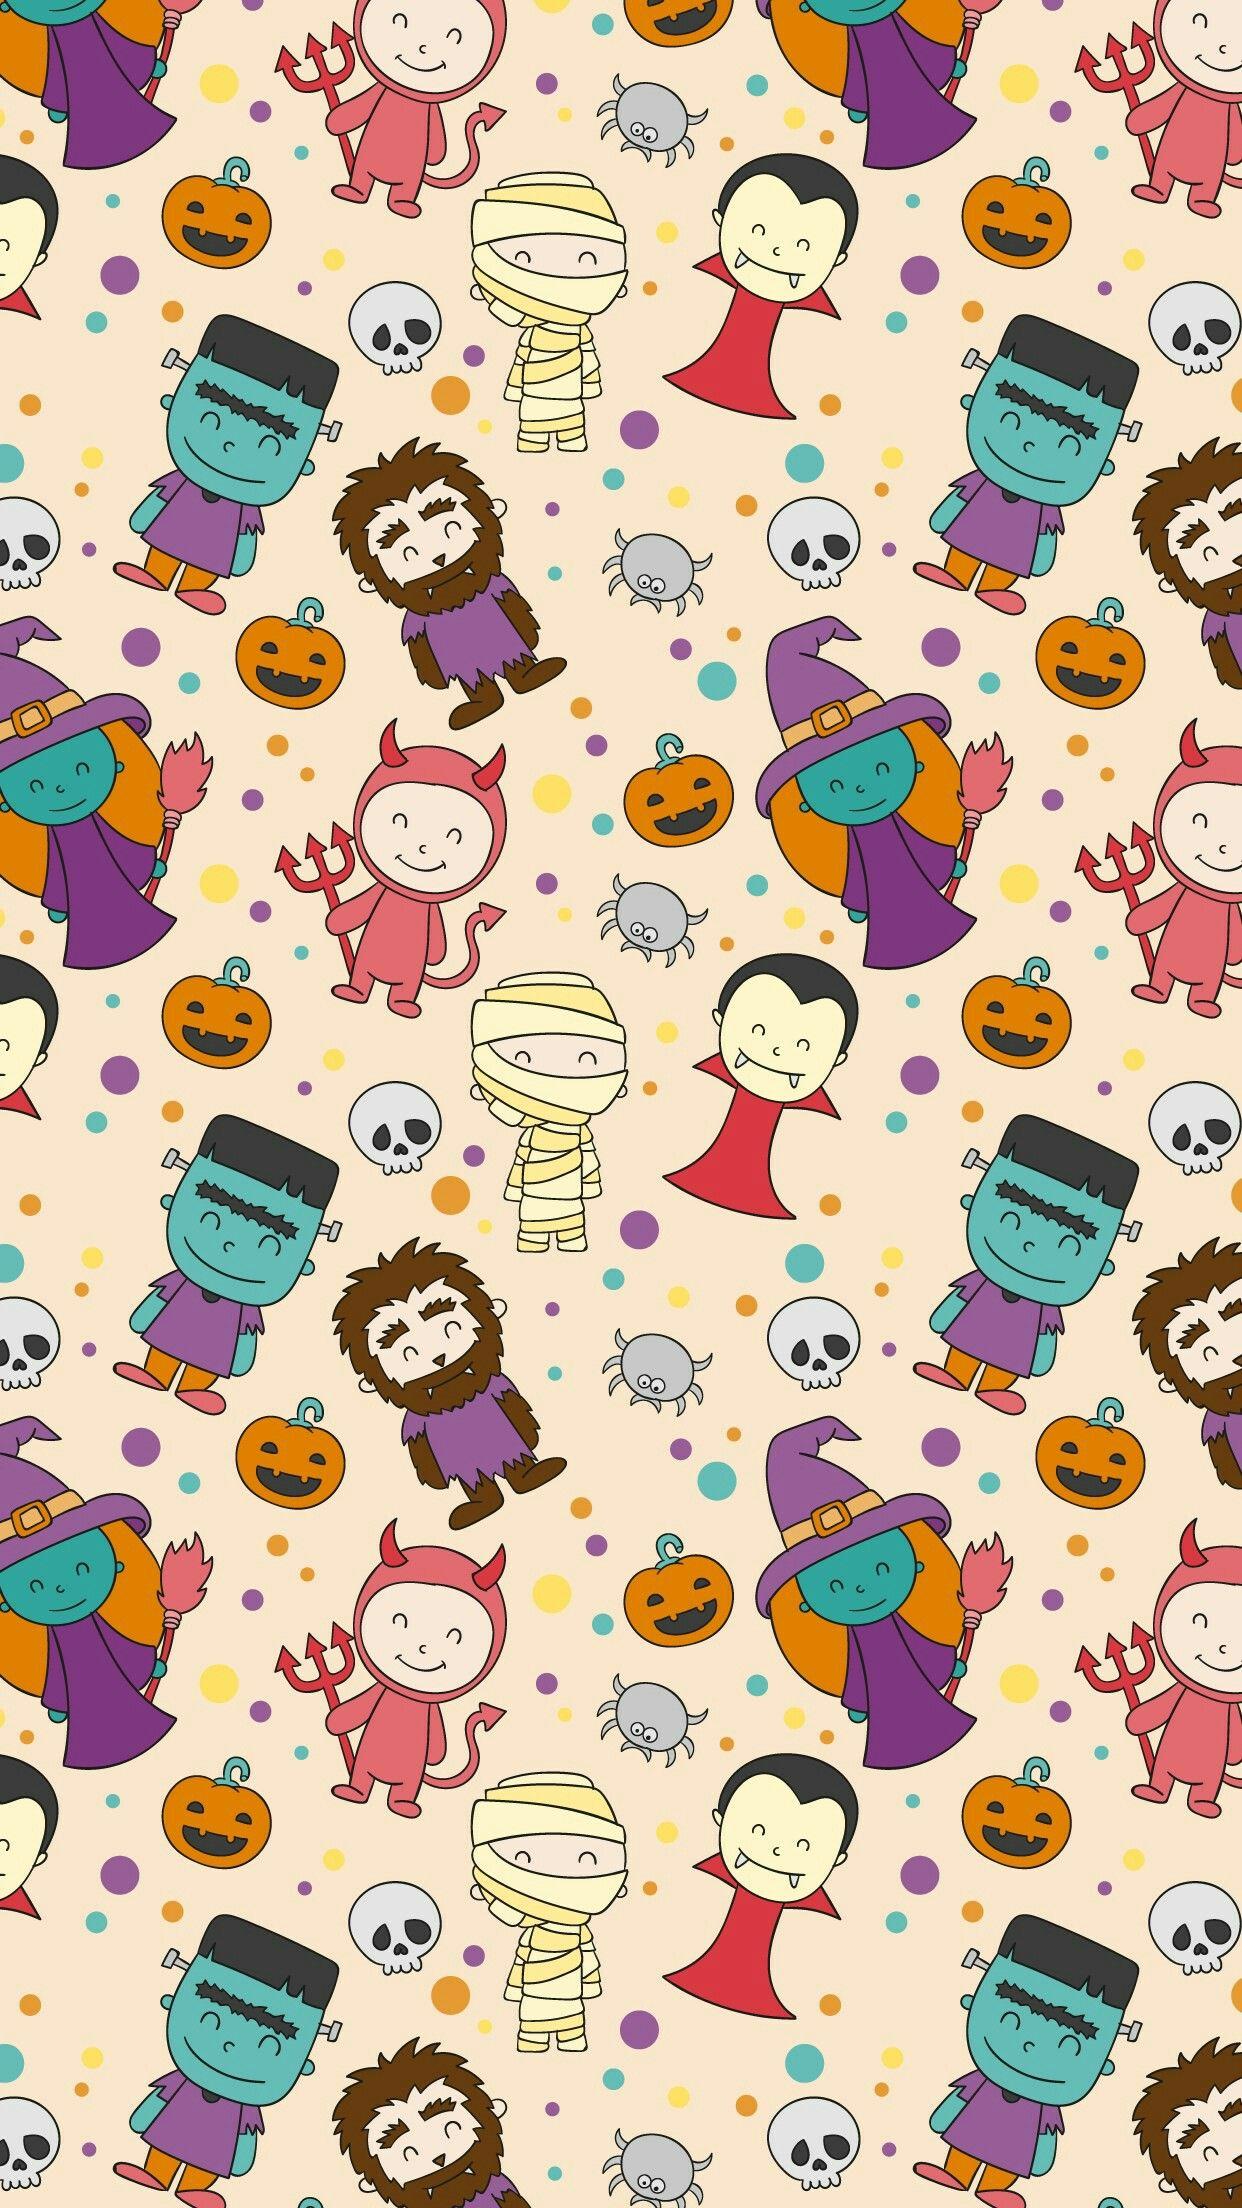 Good Wallpaper Hello Kitty Holiday - d4534f16788ae3498227b0c79a6475c3  Snapshot_463961.jpg